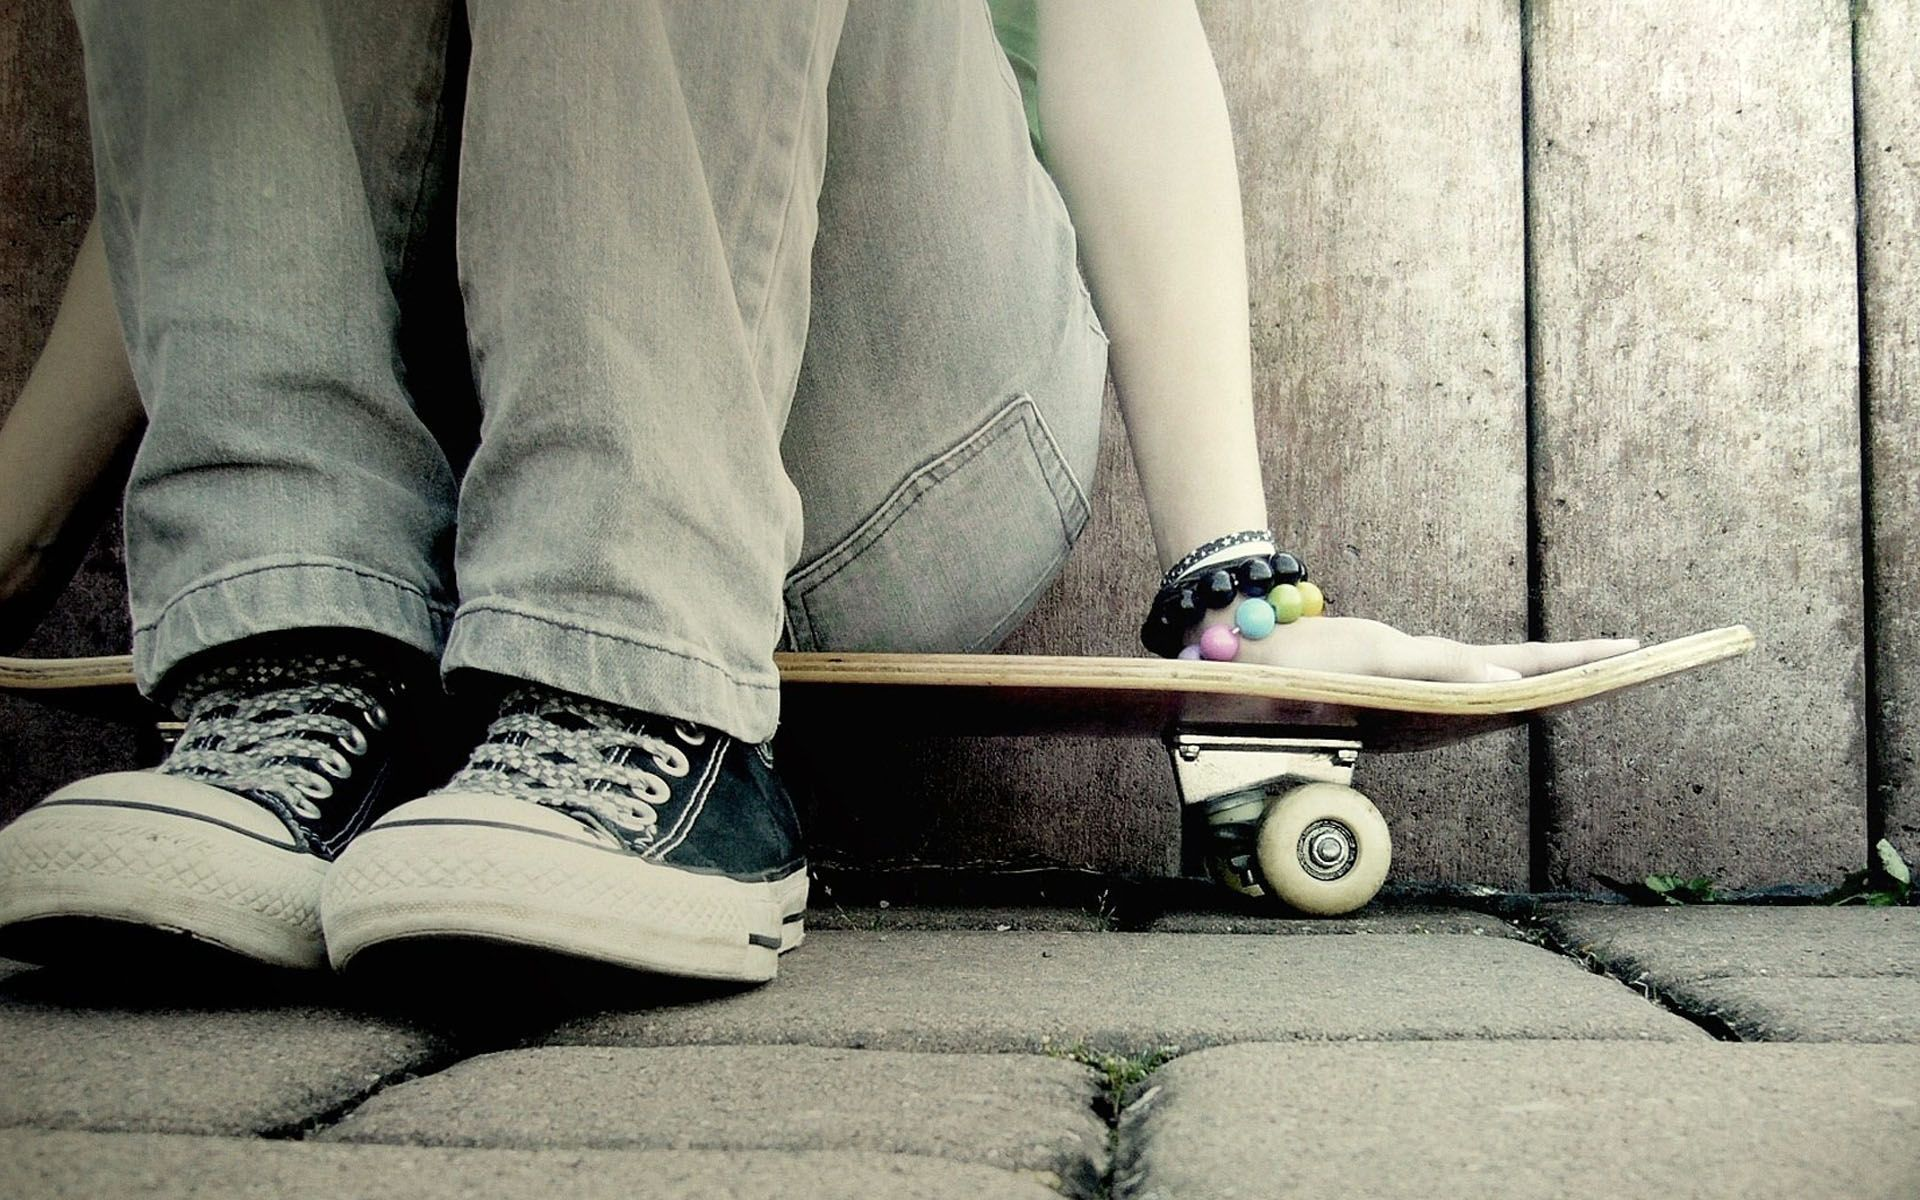 skateboard-wallpaper